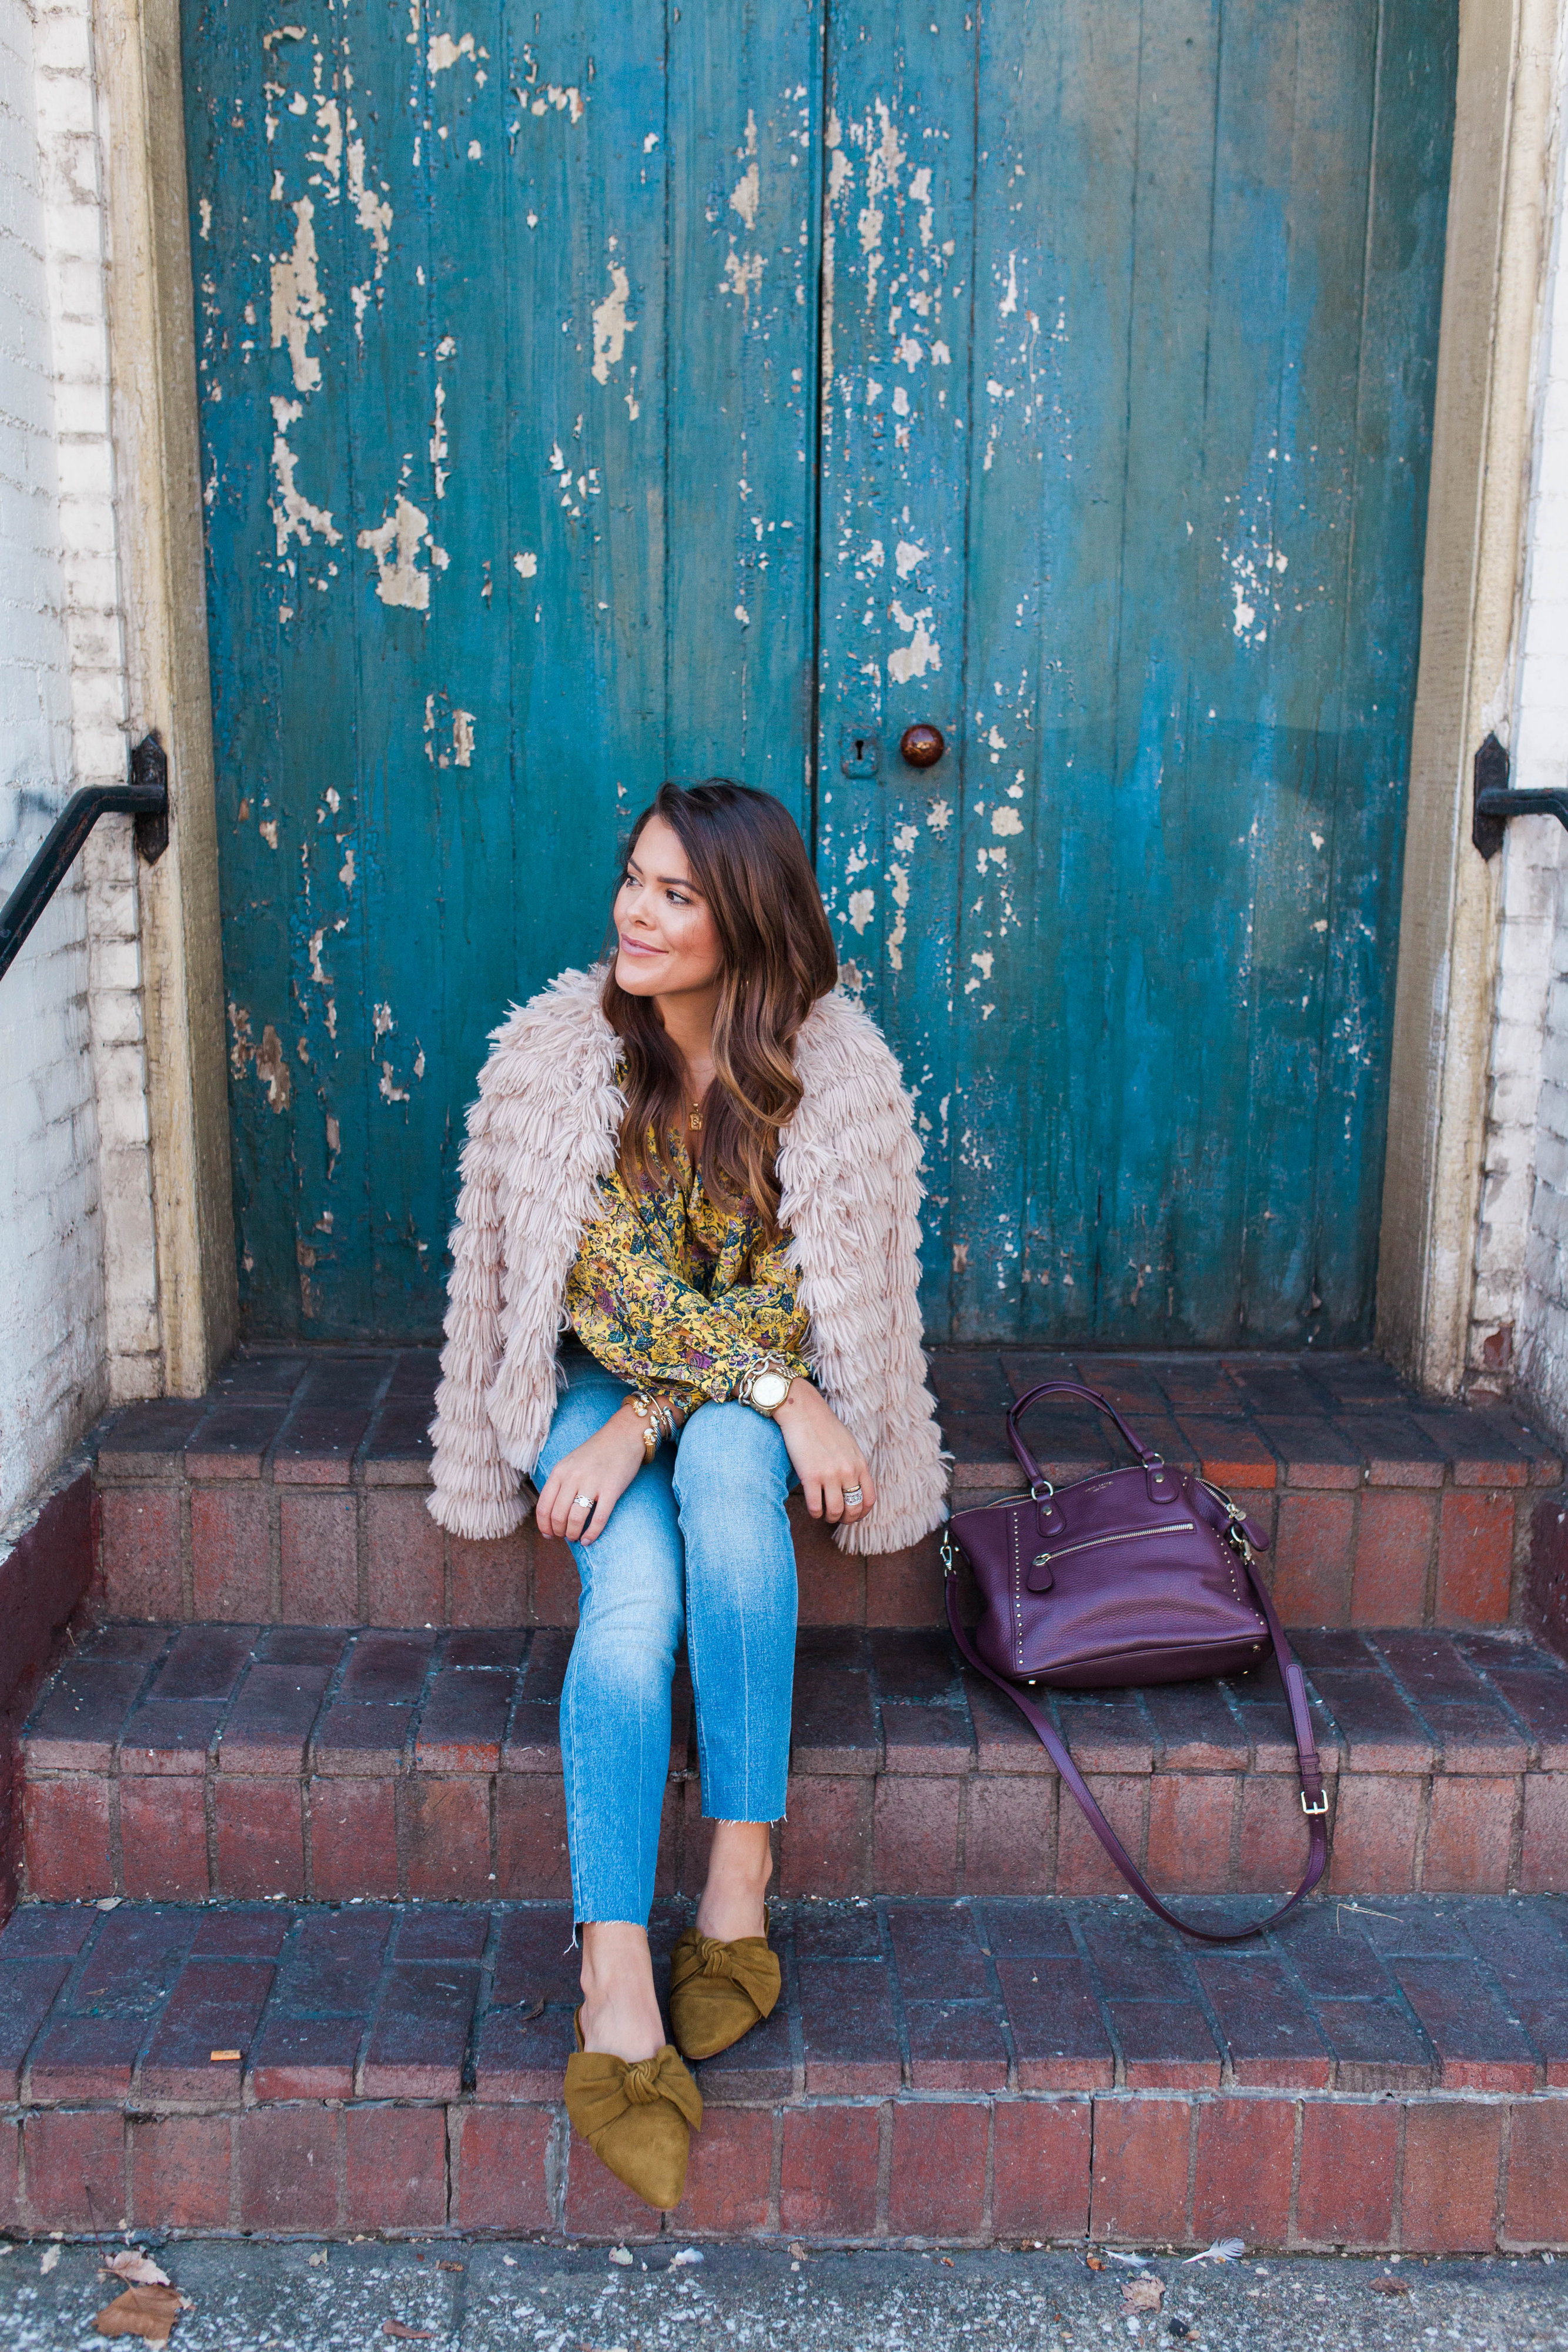 Fun fall outerwear / Fall floral blouse